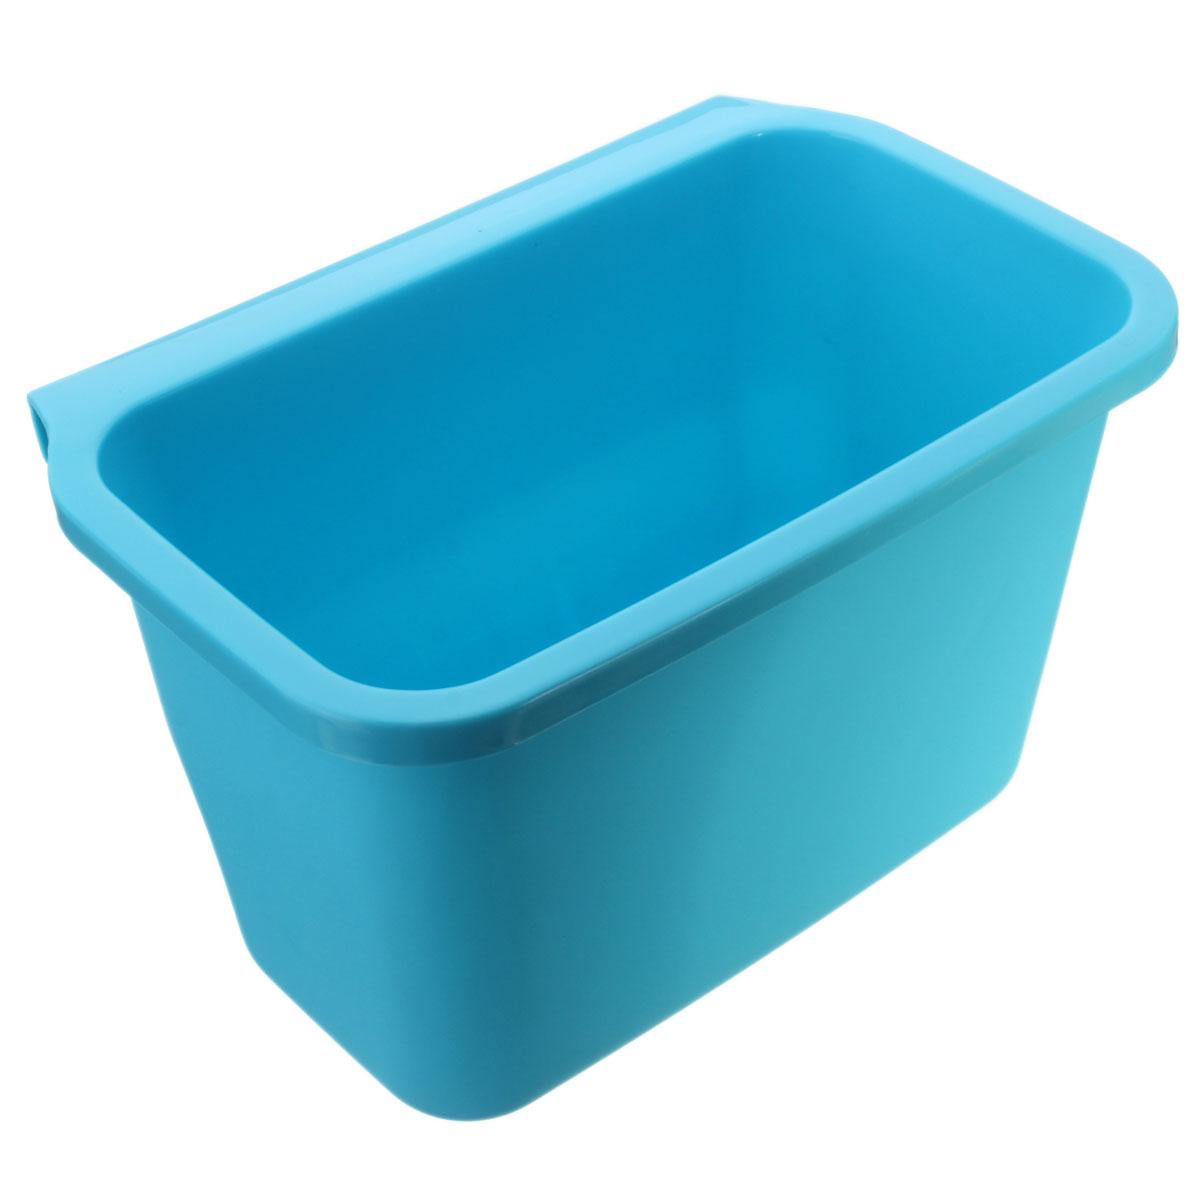 abfallsammler küche | bnbnews.co